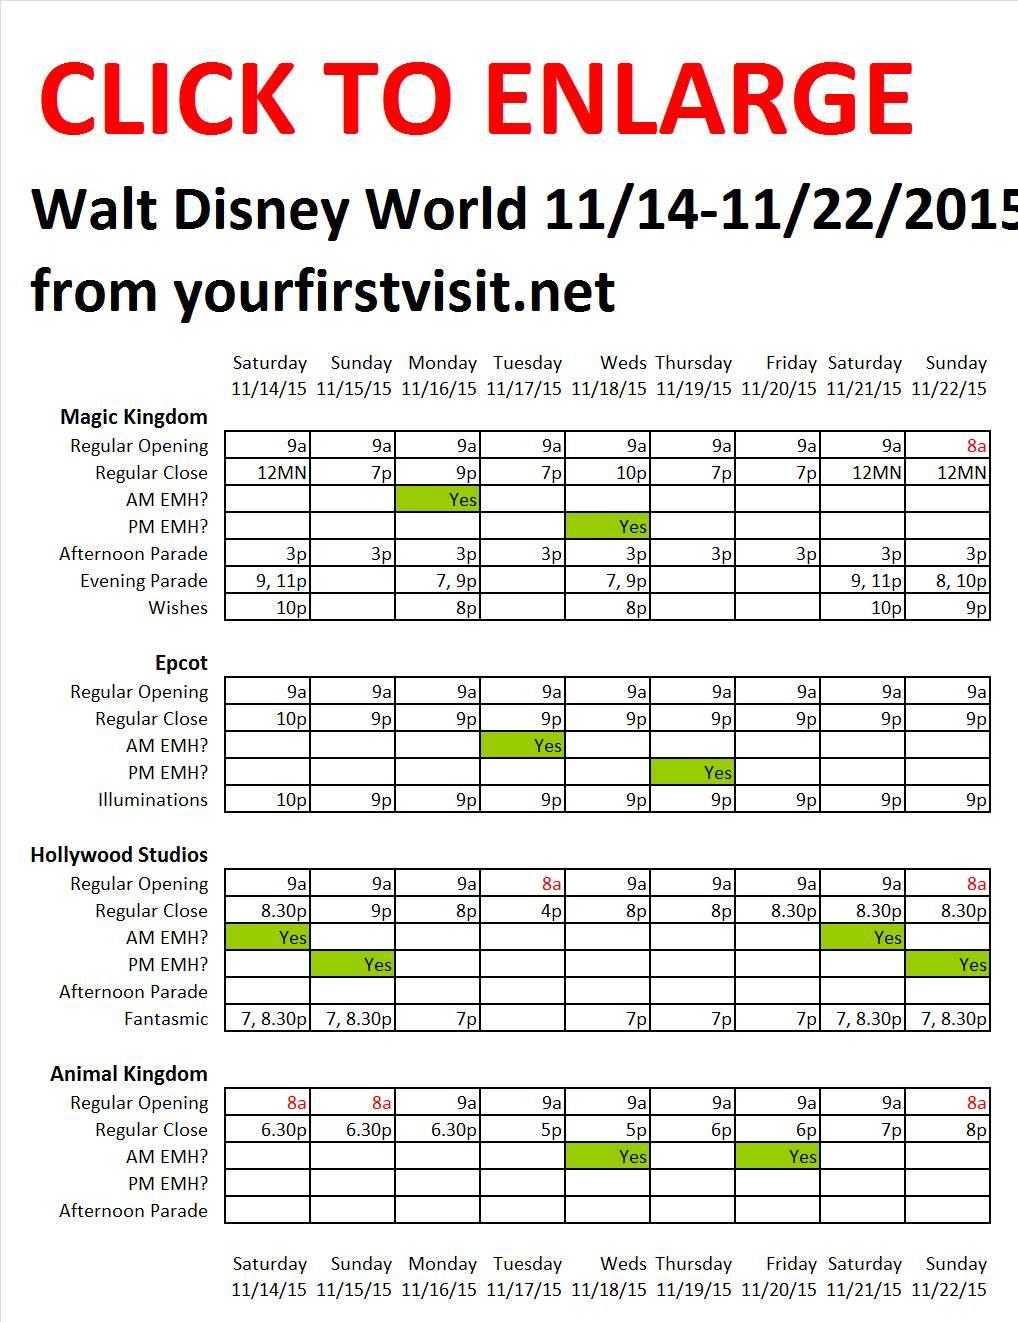 Disney World 11-14 to 11-22-2015 from yourfirstvisit.net